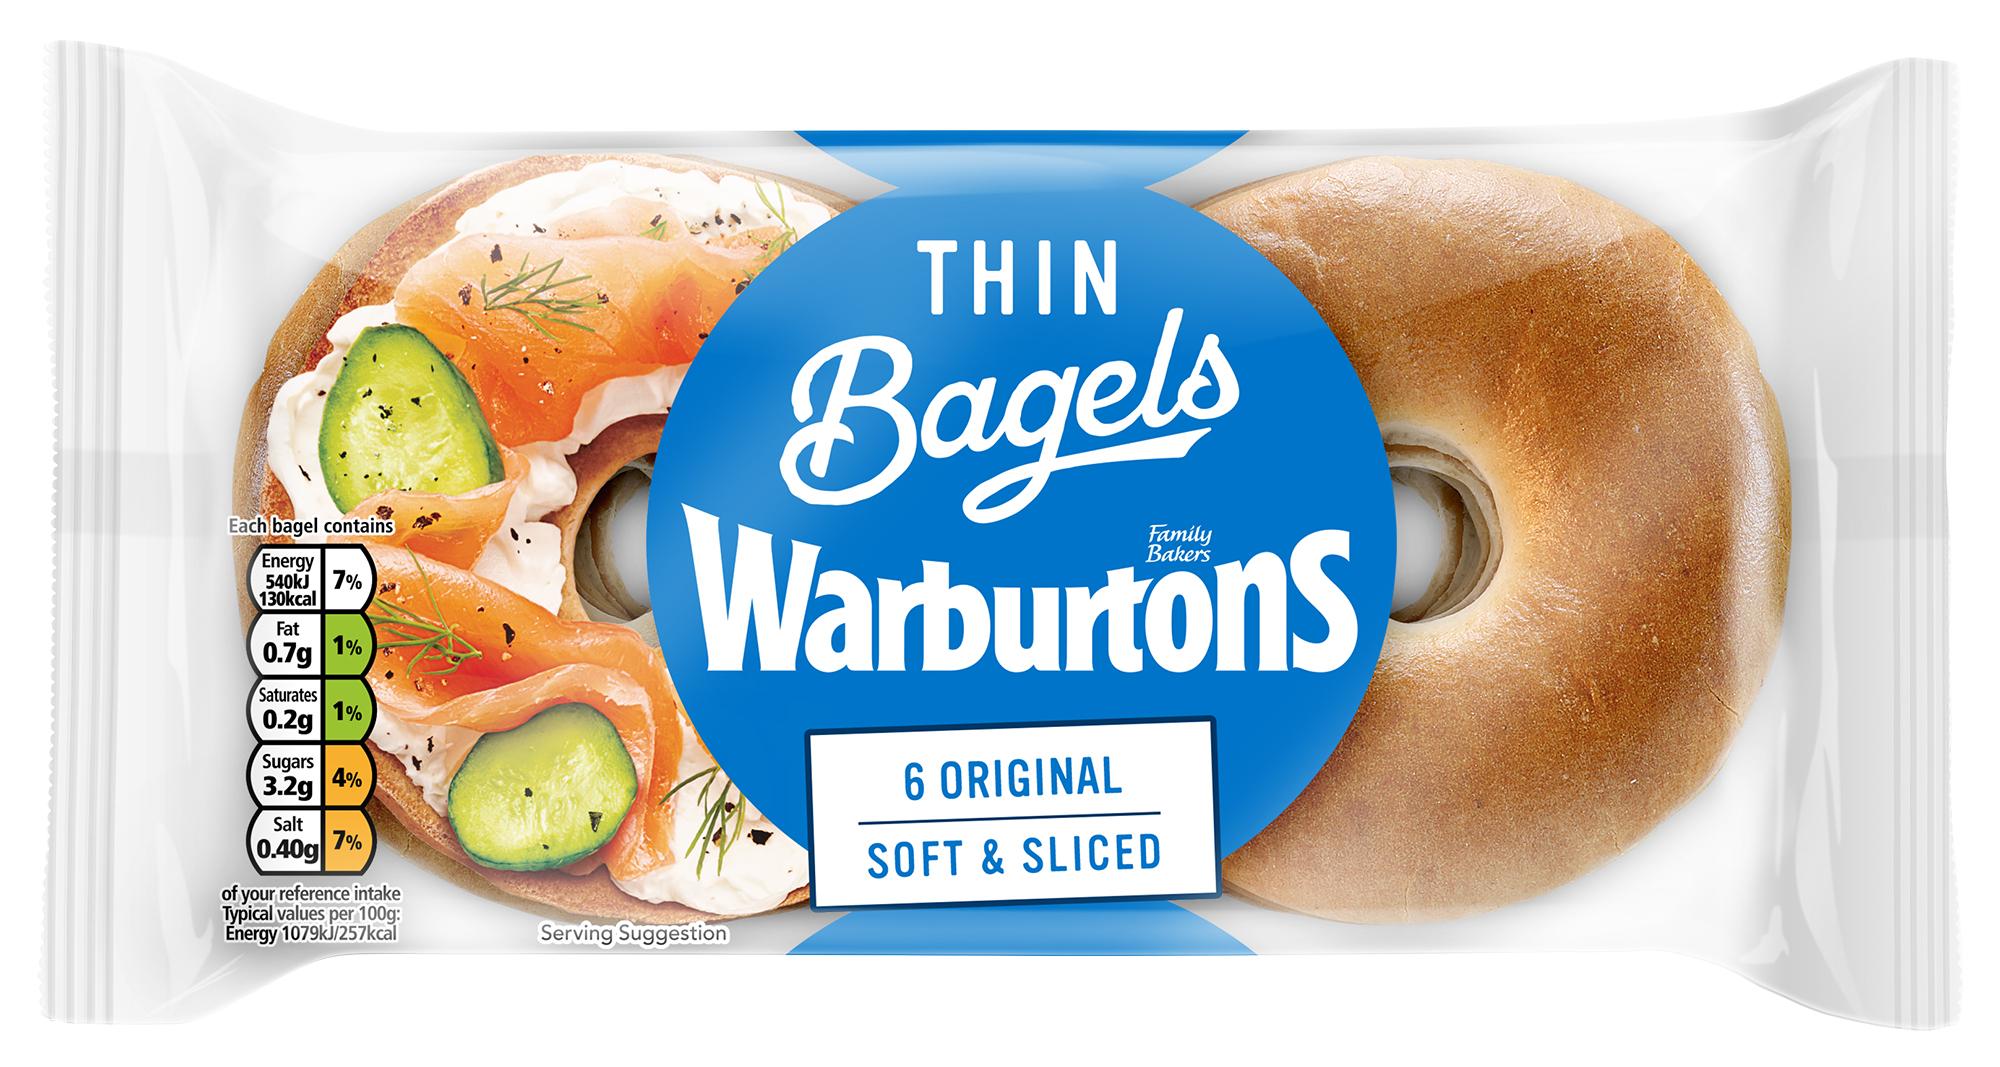 6 Original Thin Bagels